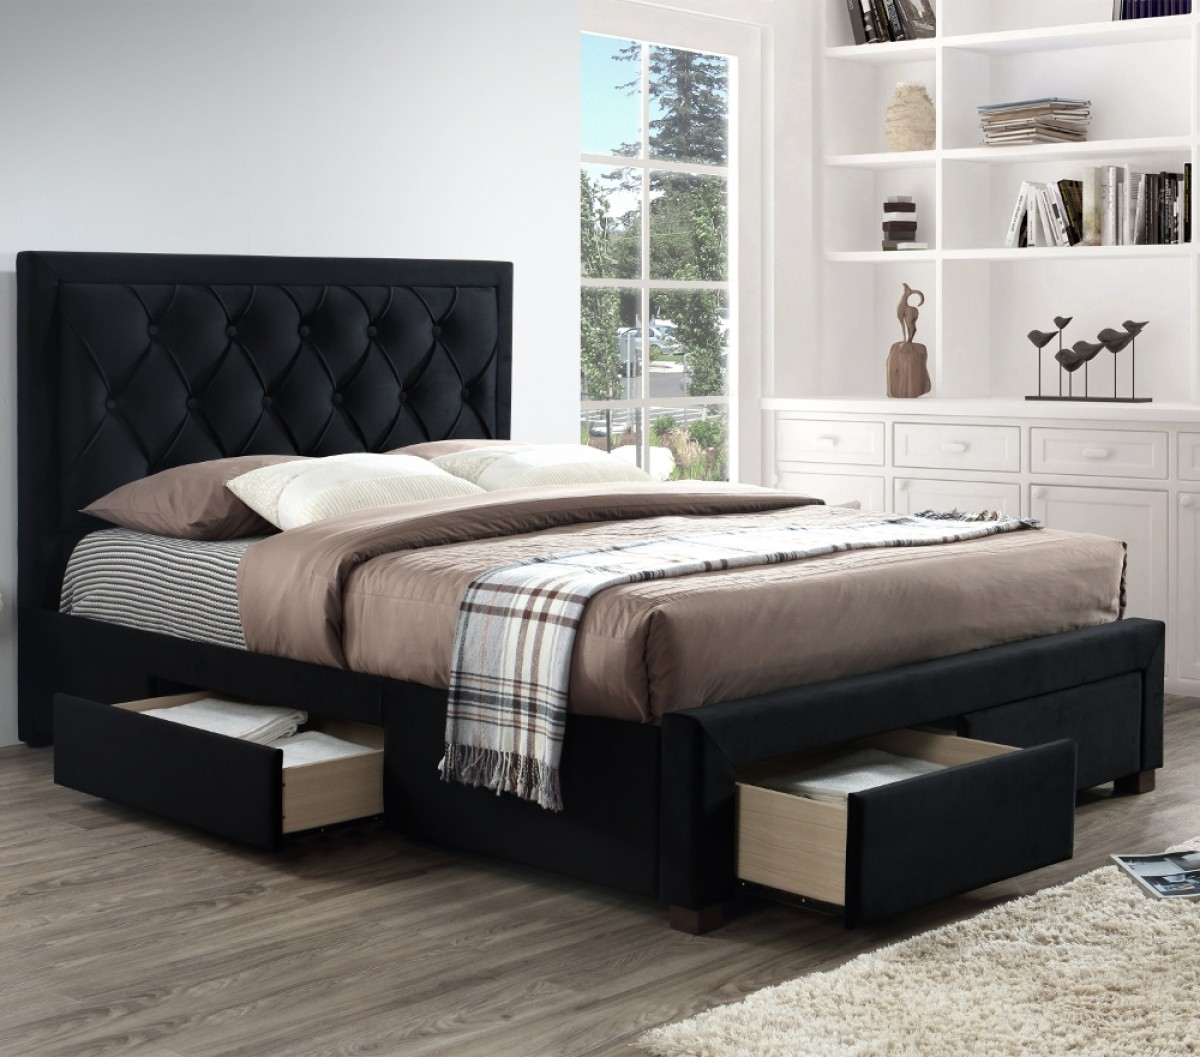 Woodbury Black Velvet Fabric 4 Drawer Storage Bed